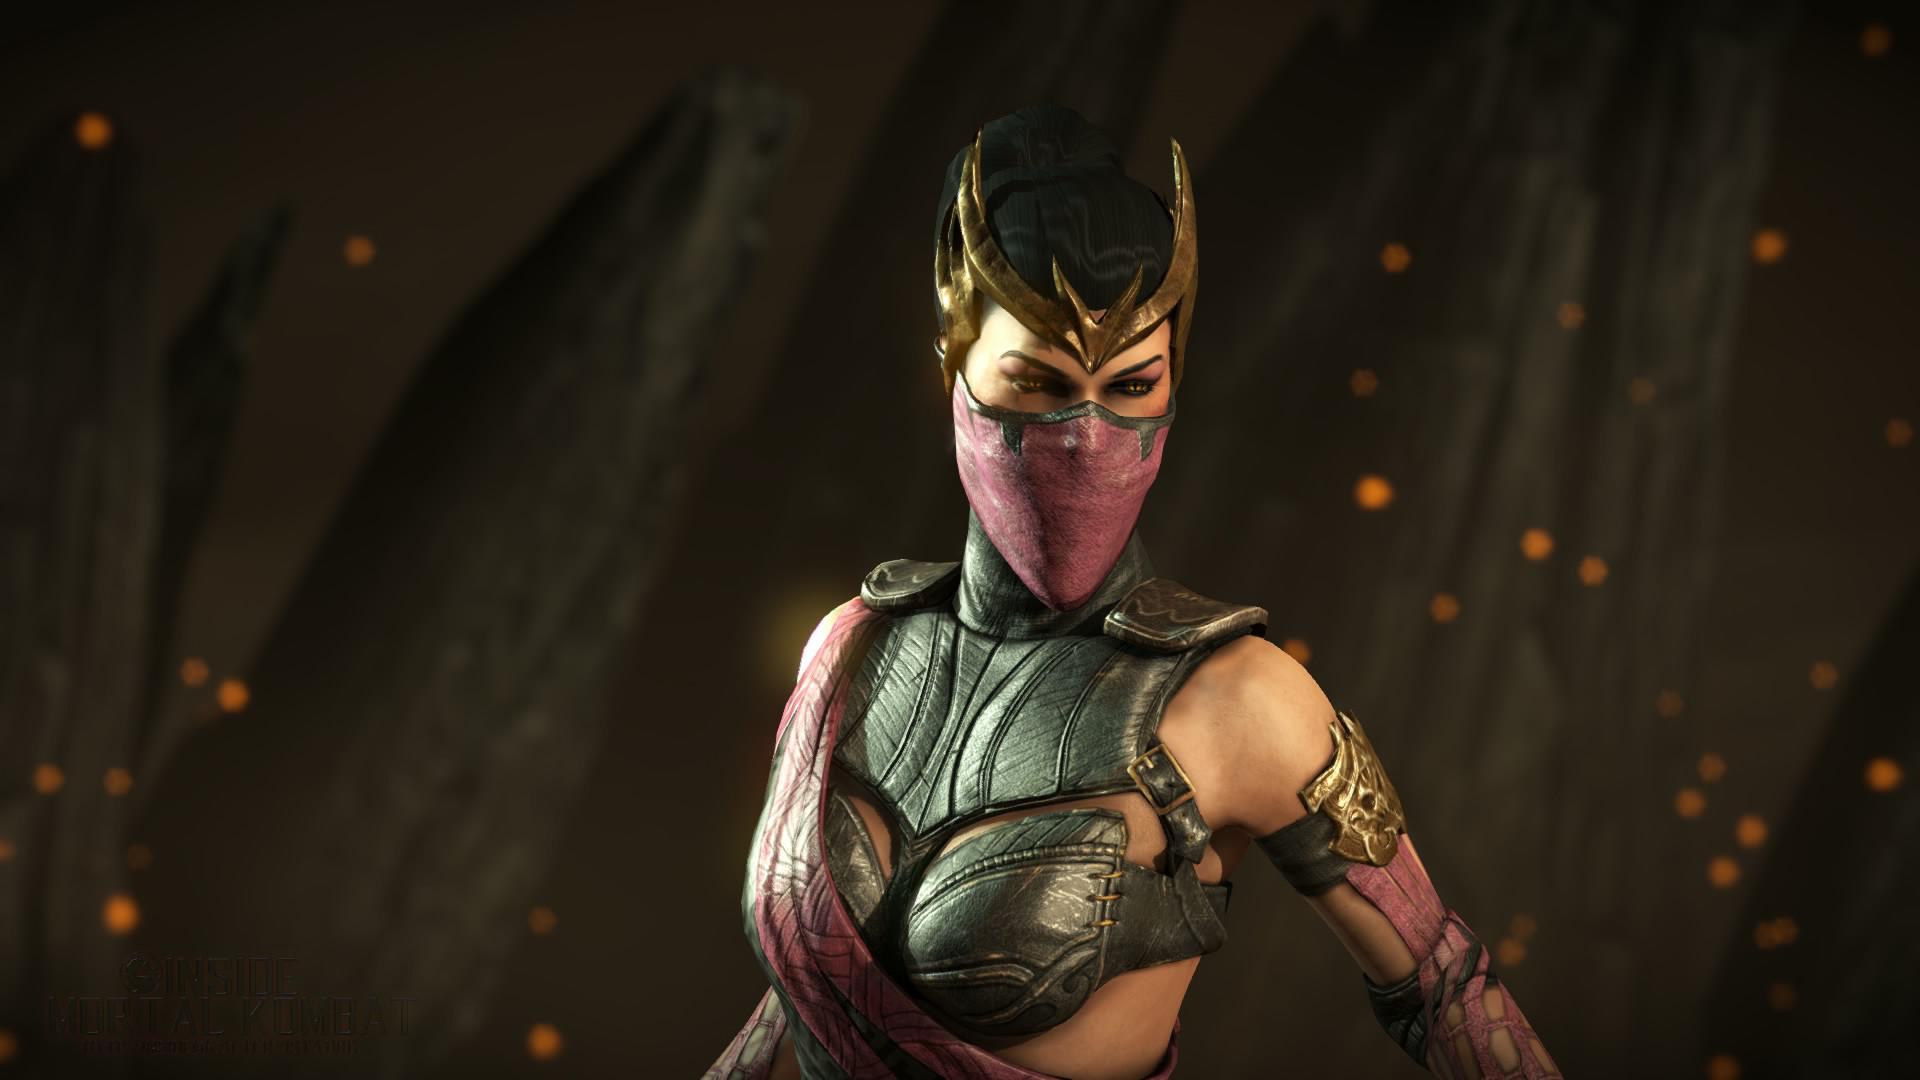 collection image wallpaper: Mortal Kombat X Mileena